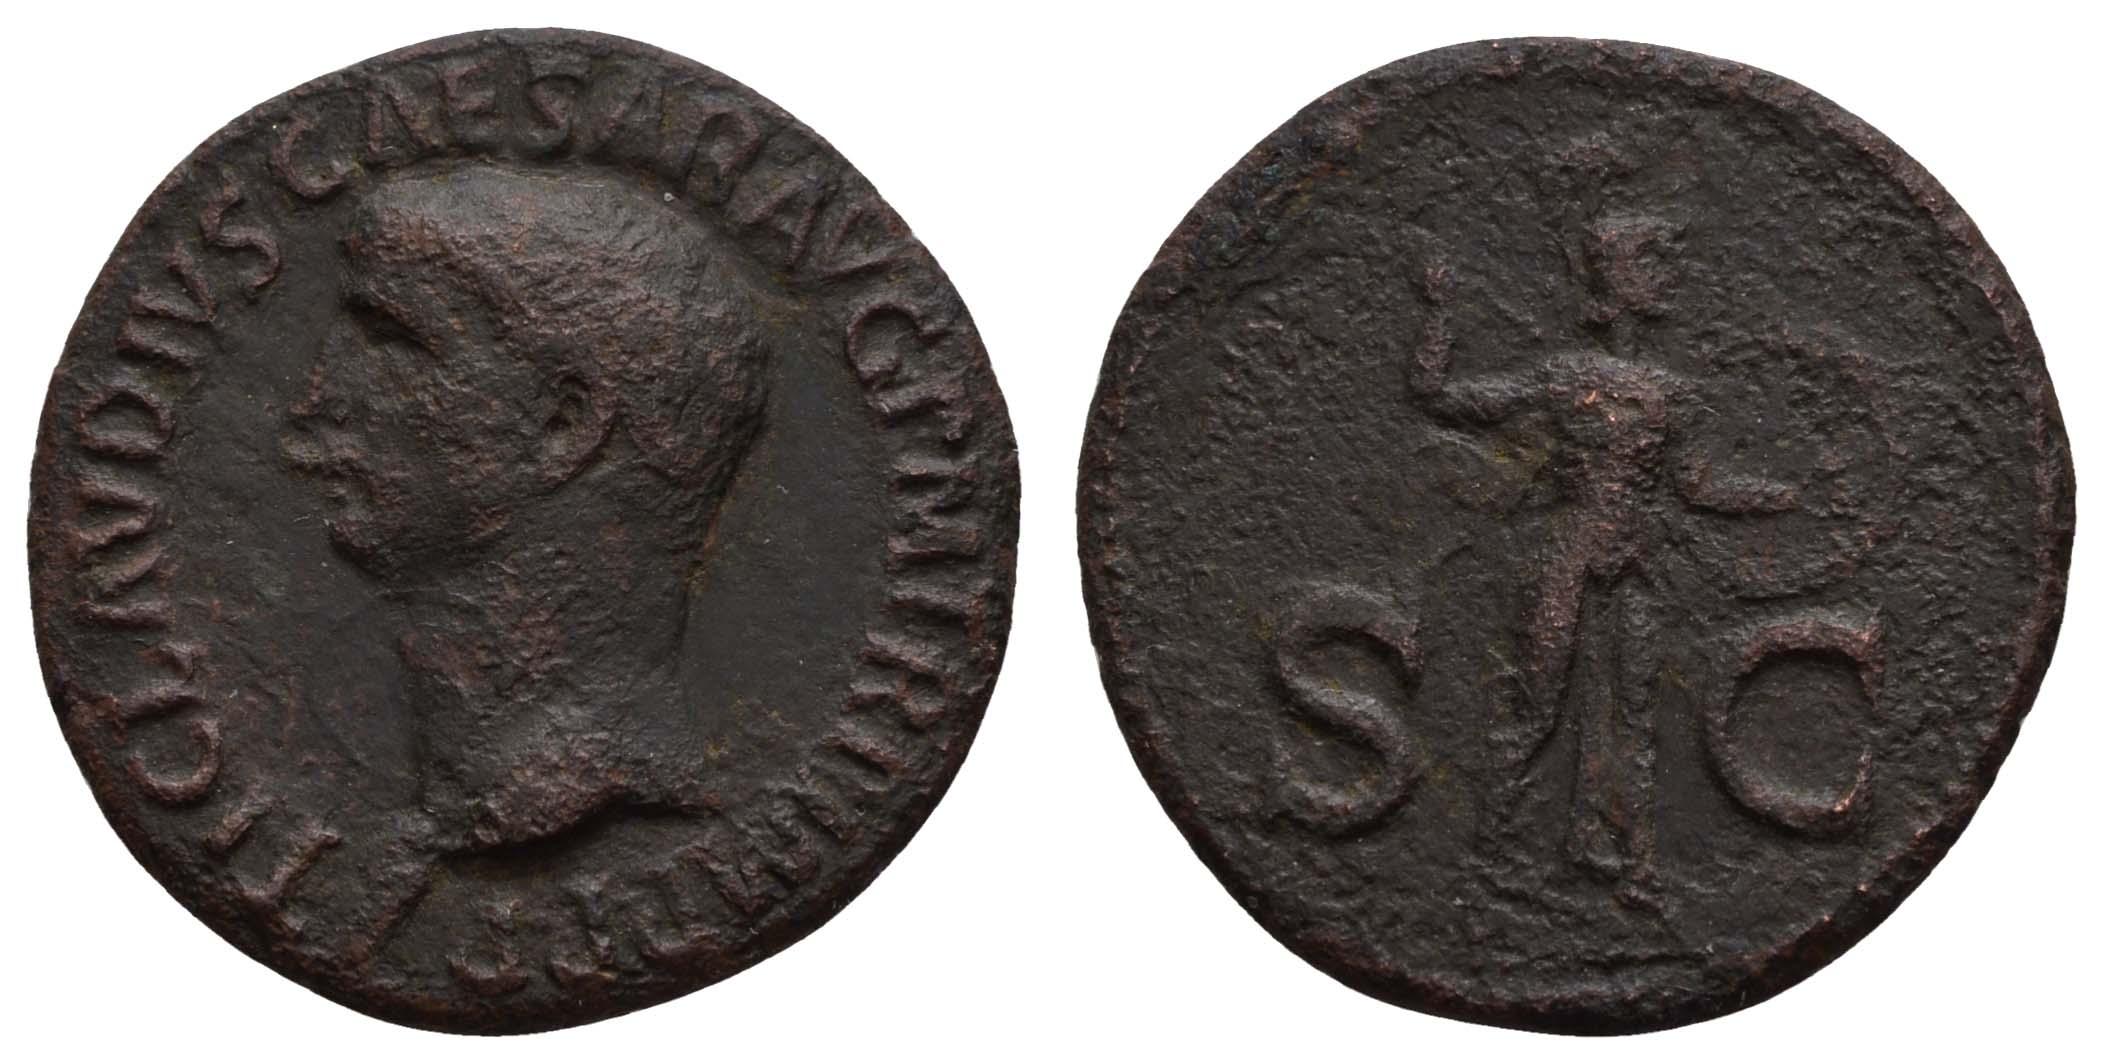 Lot 134 - Antike Römer - Kaiserzeit -  Auktionshaus Ulrich Felzmann GmbH & Co. KG Coins single lots